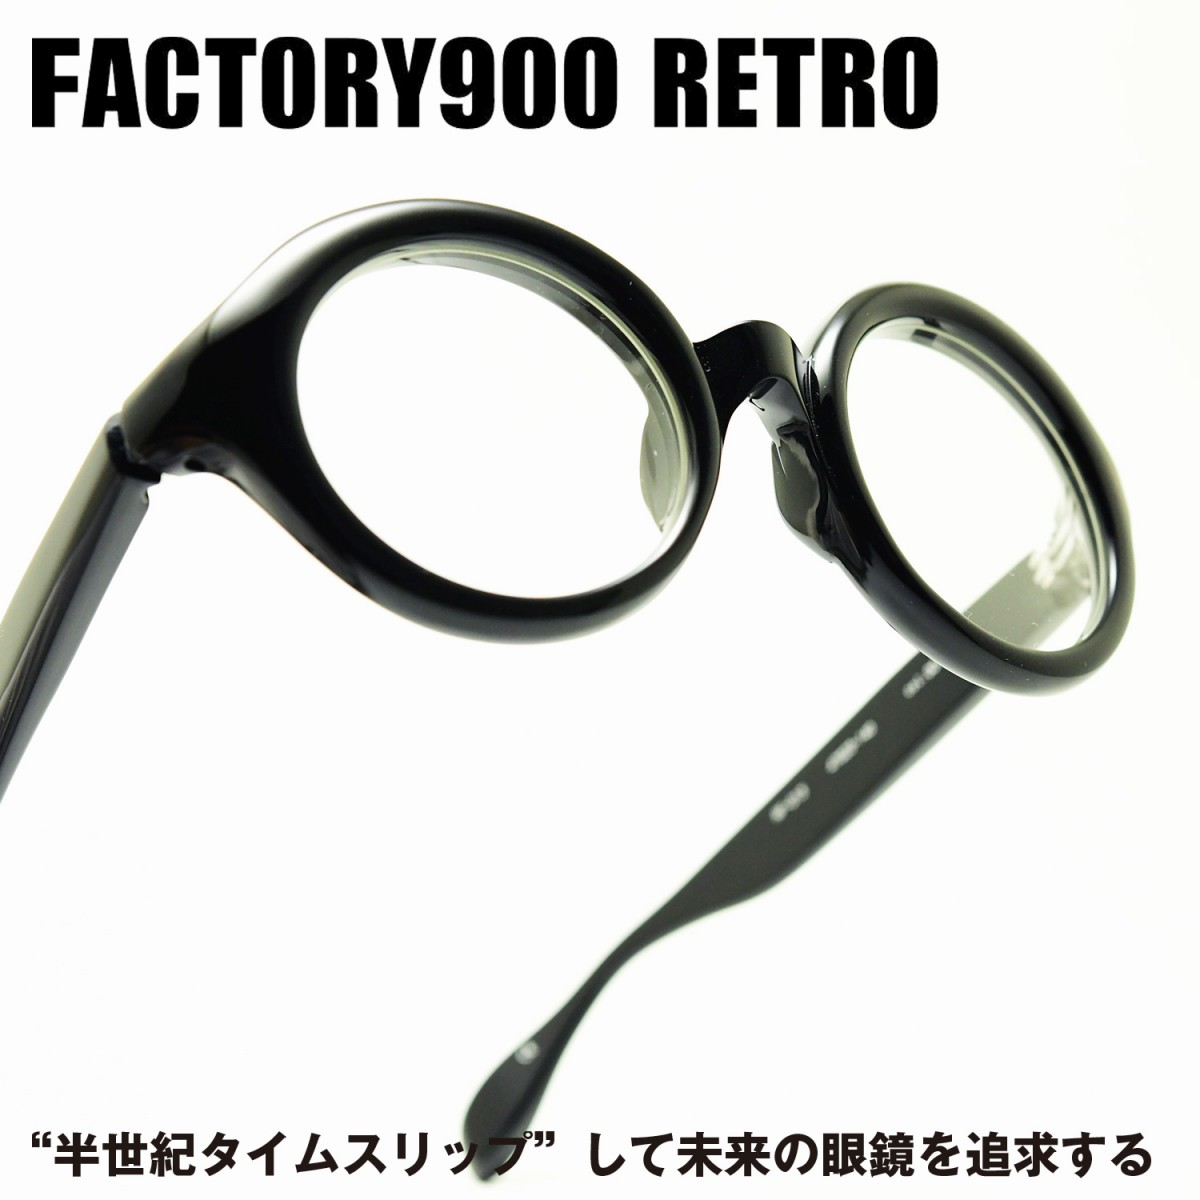 FACTORY900 RETRO ファクトリー900レトロRF-013 col-001